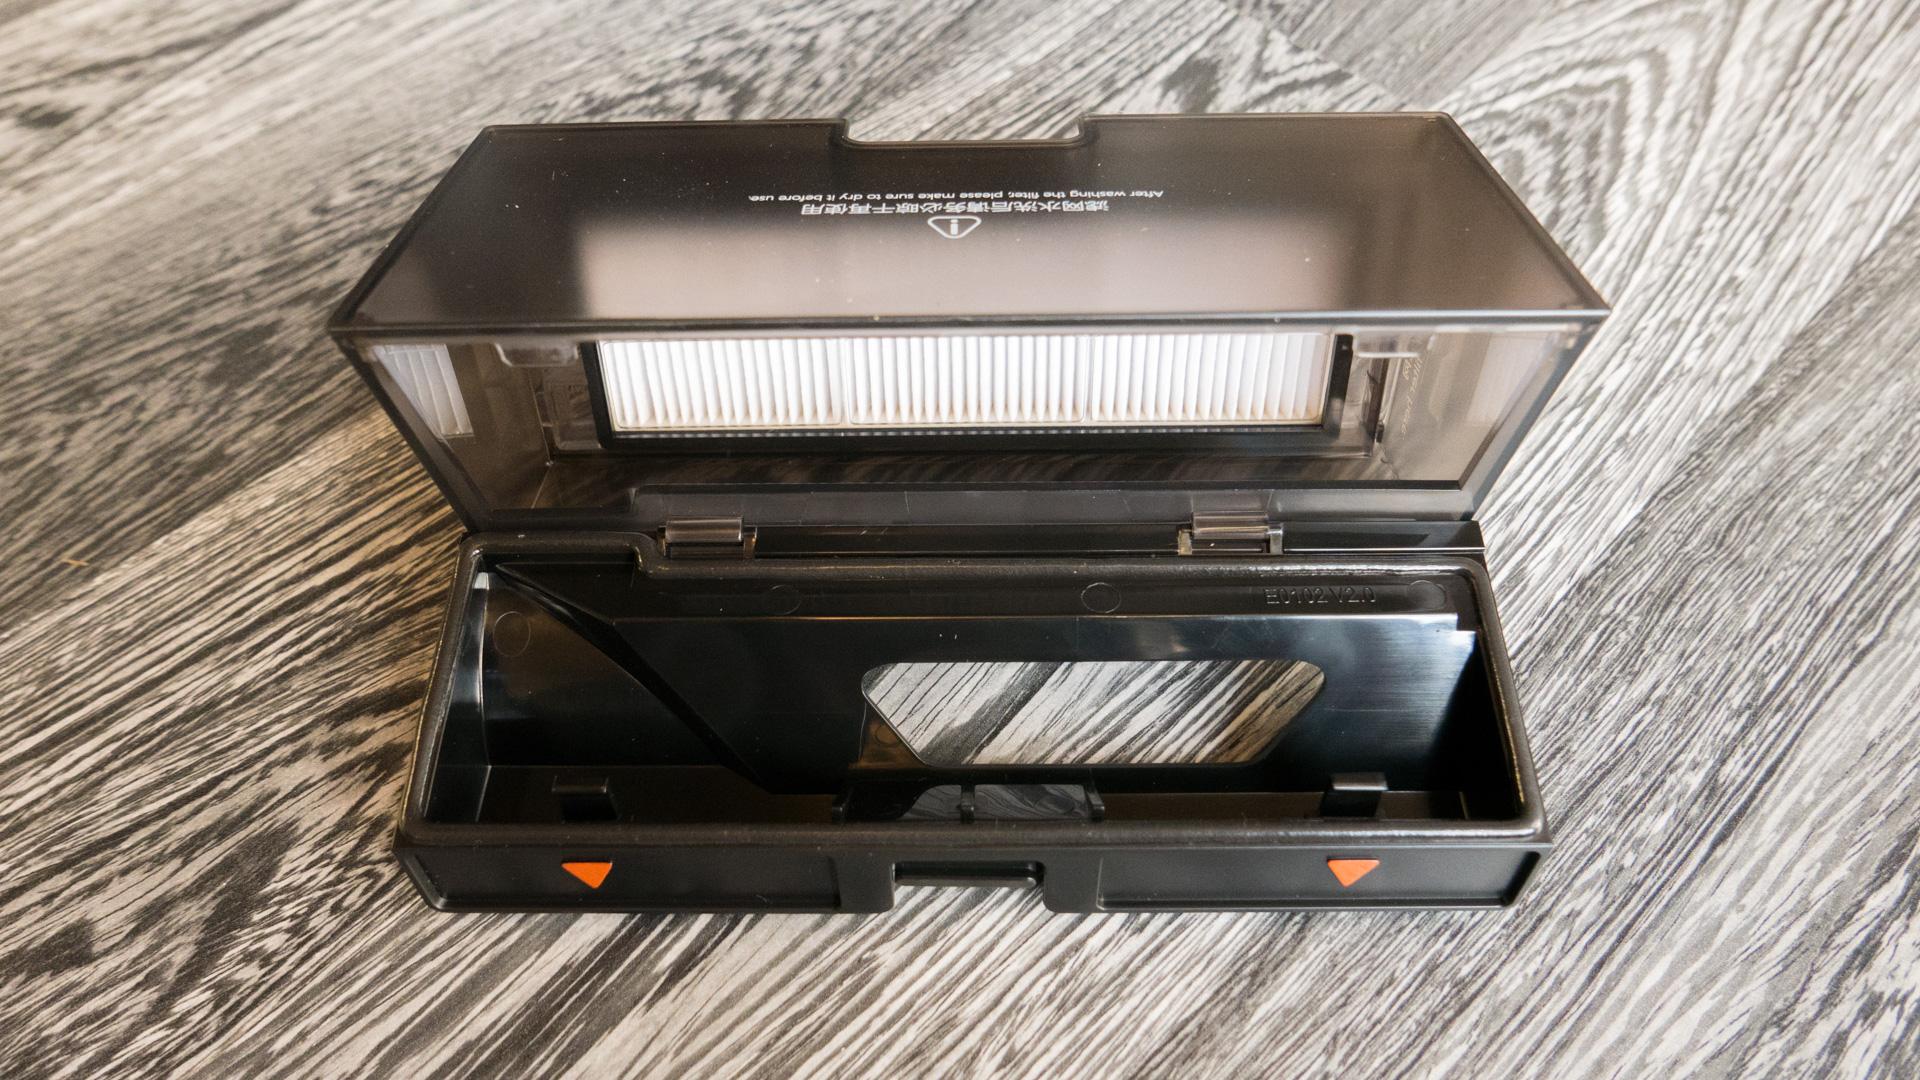 Xiaomi-roborock-S55-Staubbehälter-1